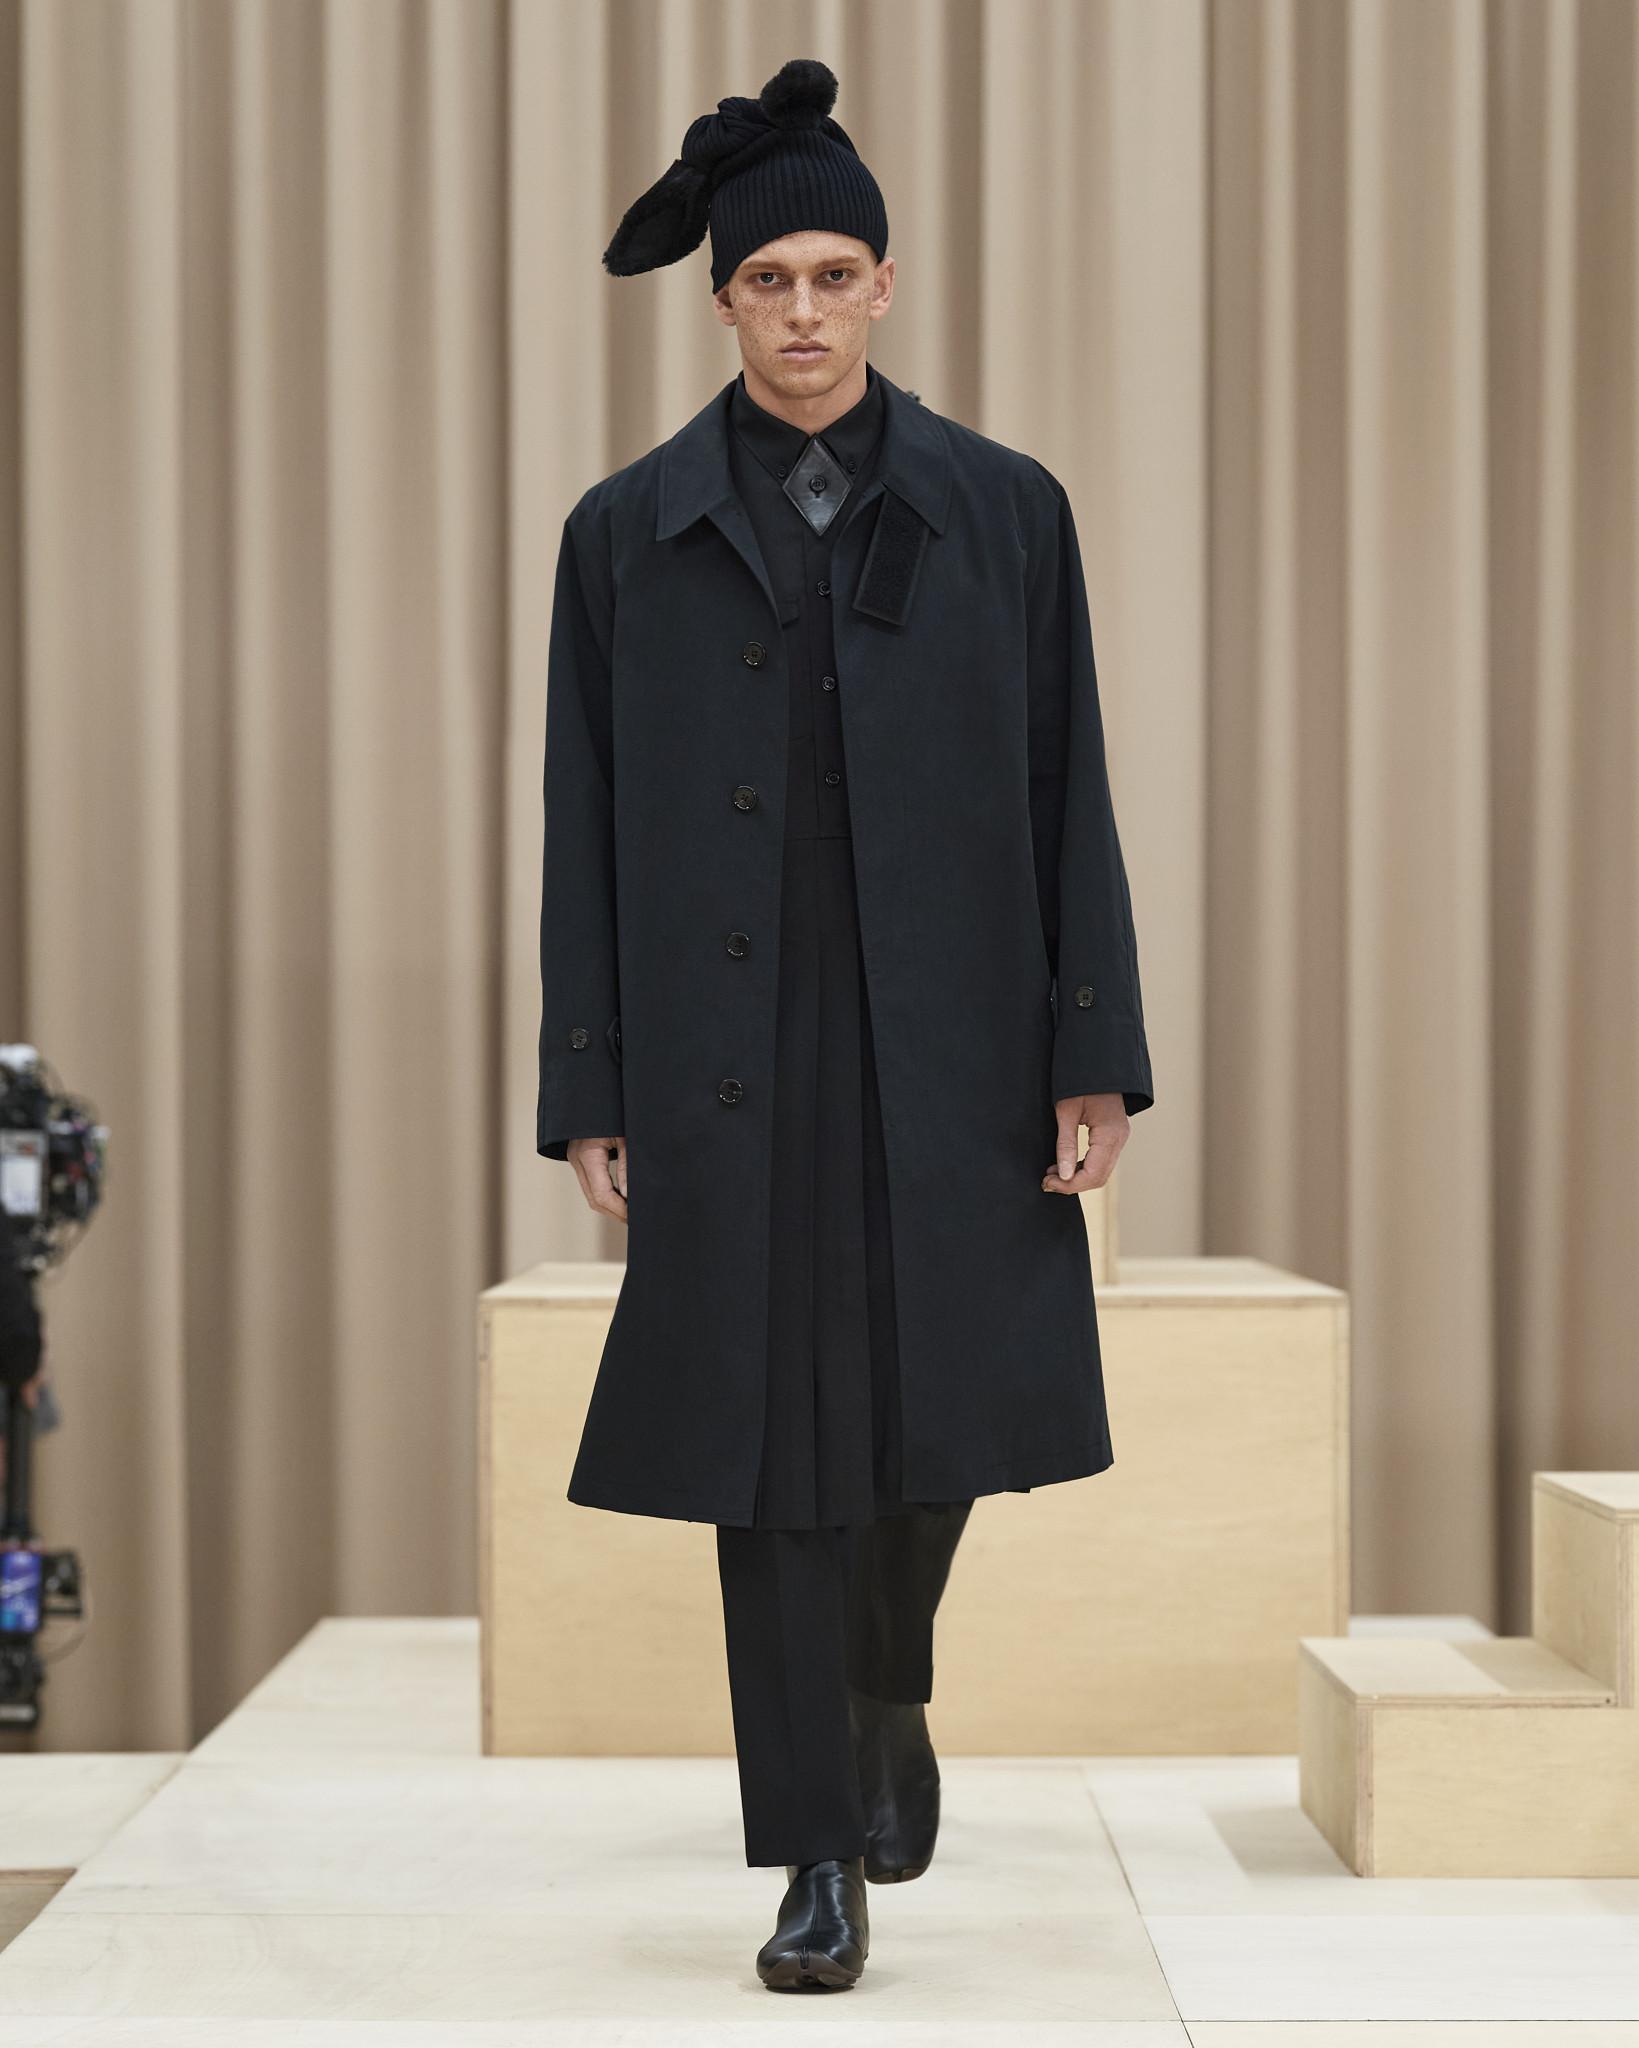 Burberry AW21 Menswear